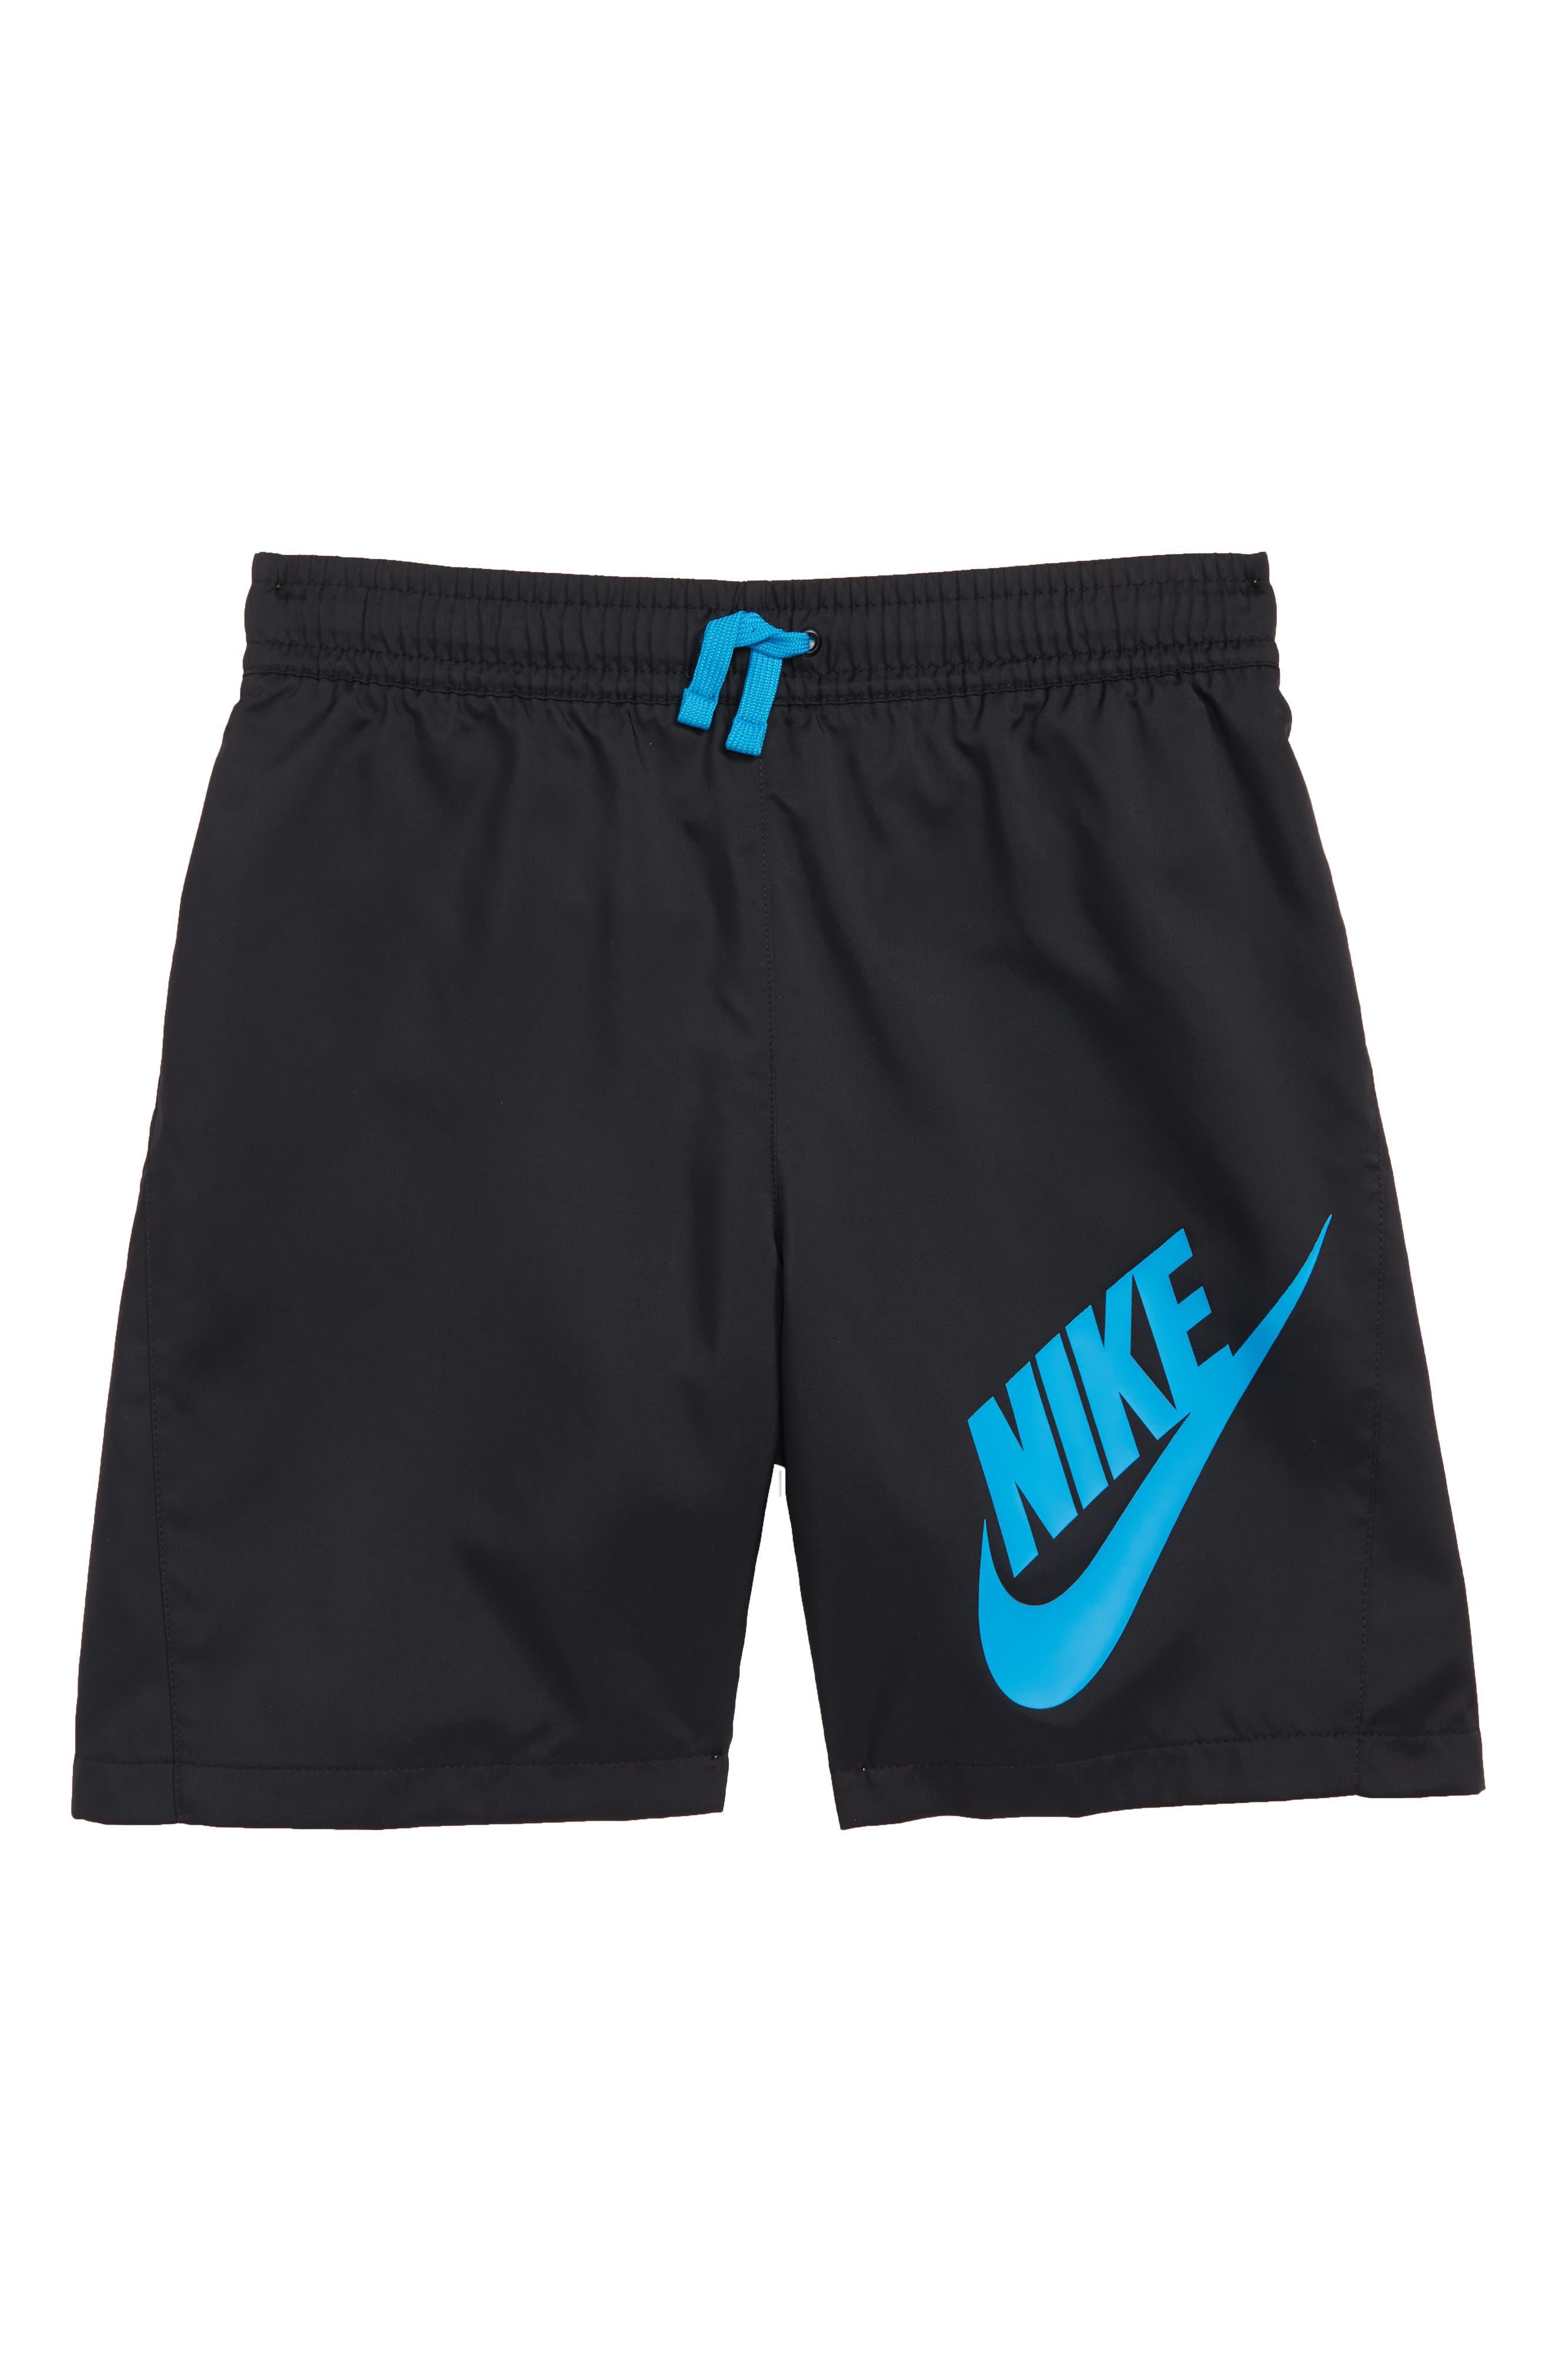 Woven Shorts,                         Main,                         color, Black/ Equator Blue